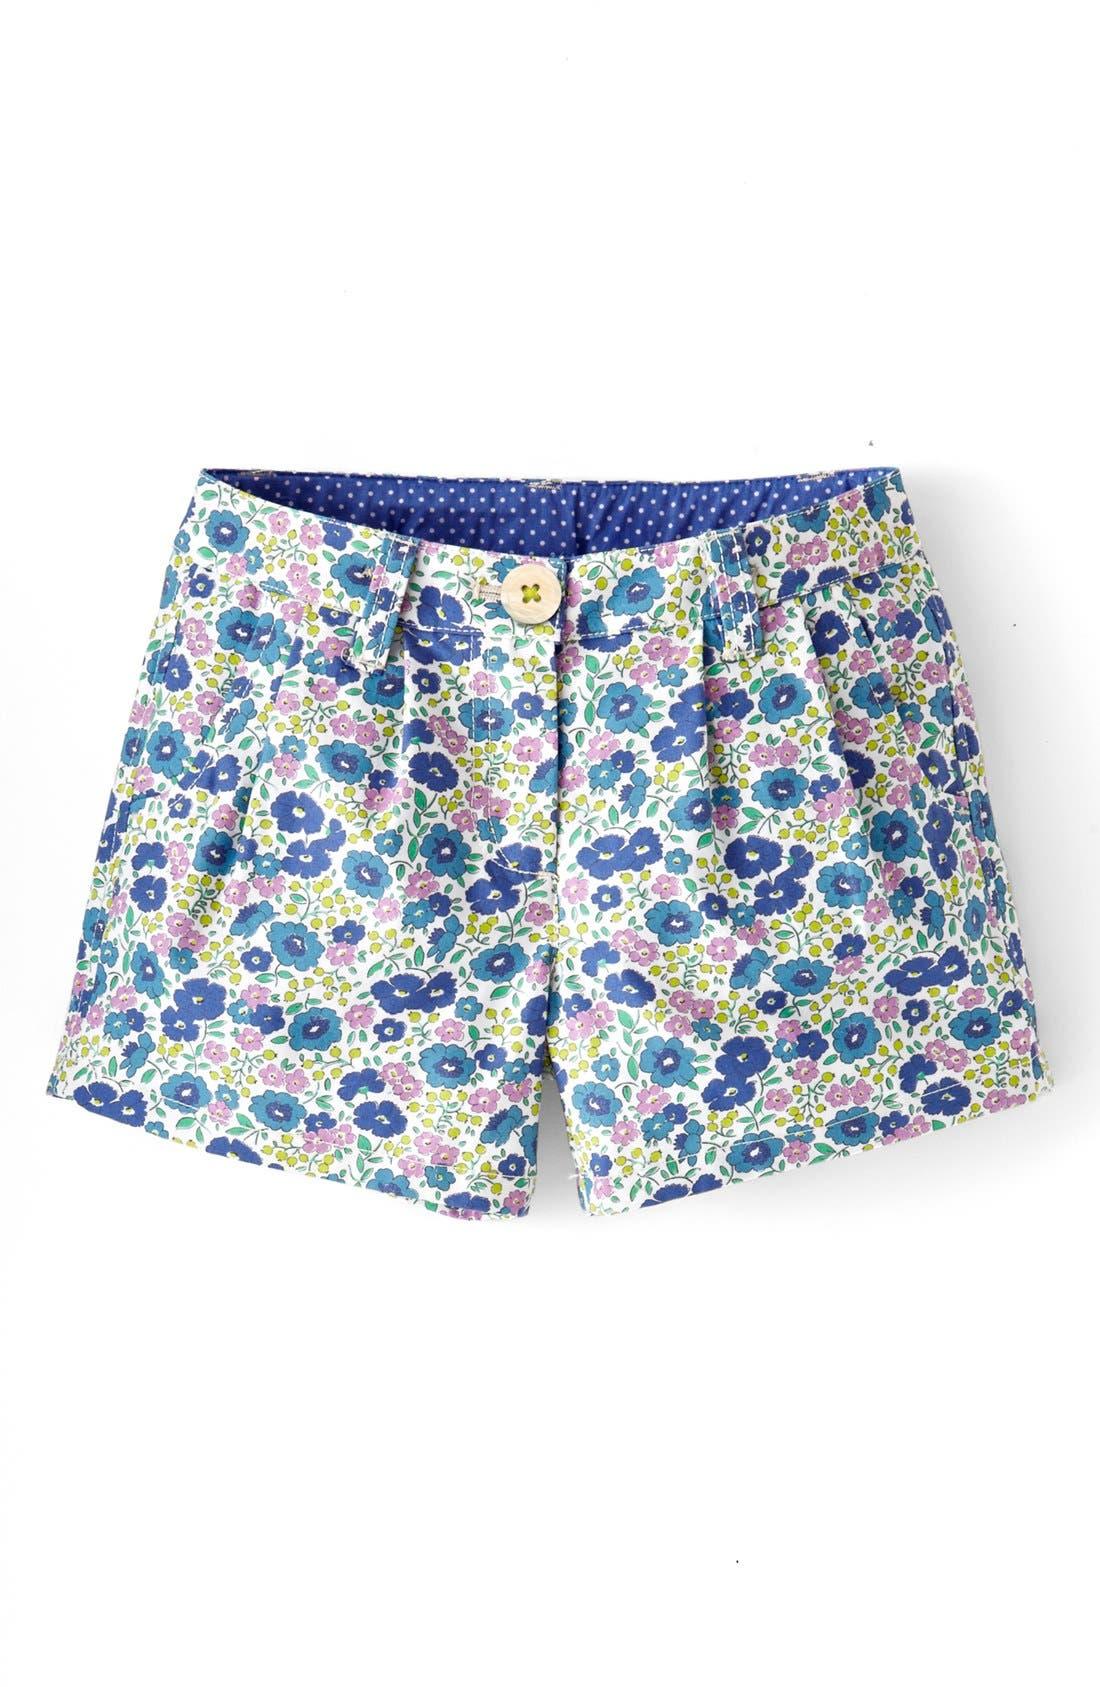 Alternate Image 1 Selected - Mini Boden 'Amalfi' Cotton Shorts (Little Girls & Big Girls)